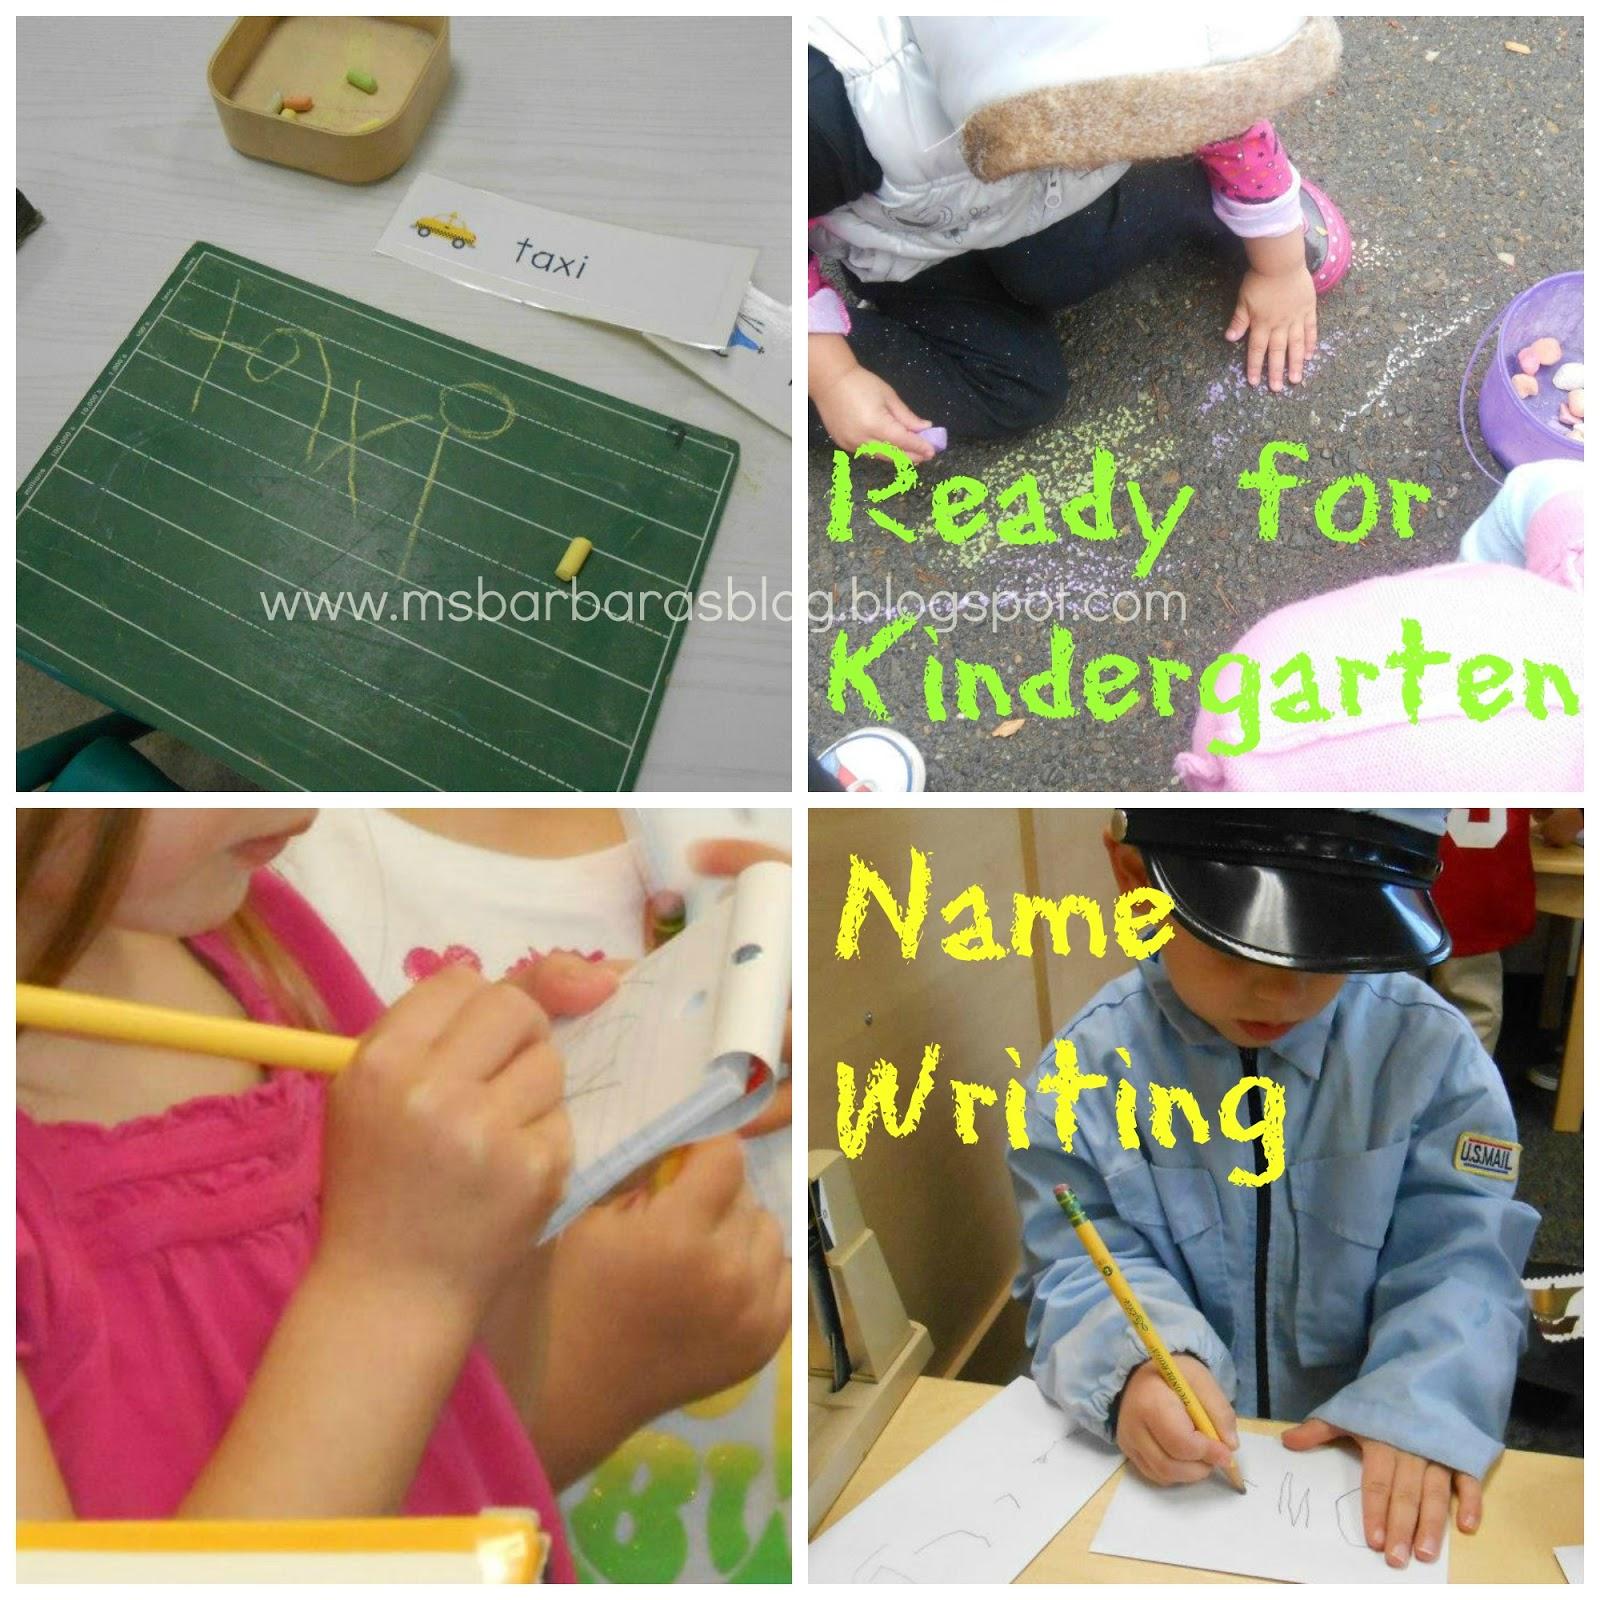 For The Children Ready For Kindergarten Name Writing